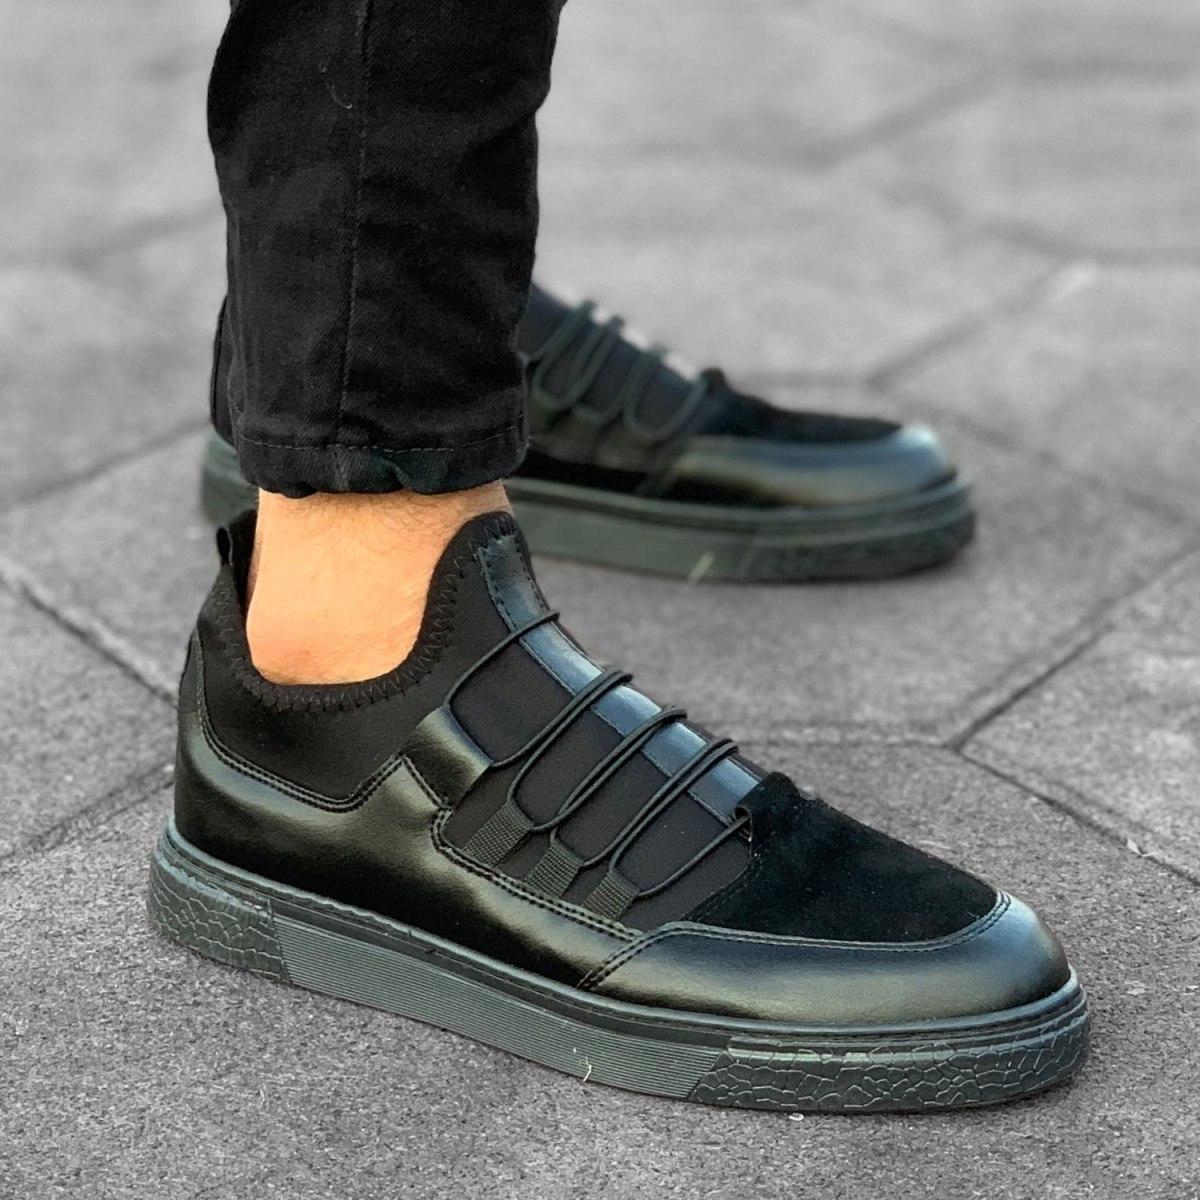 Scuba-elastic laced in Full Coal Black